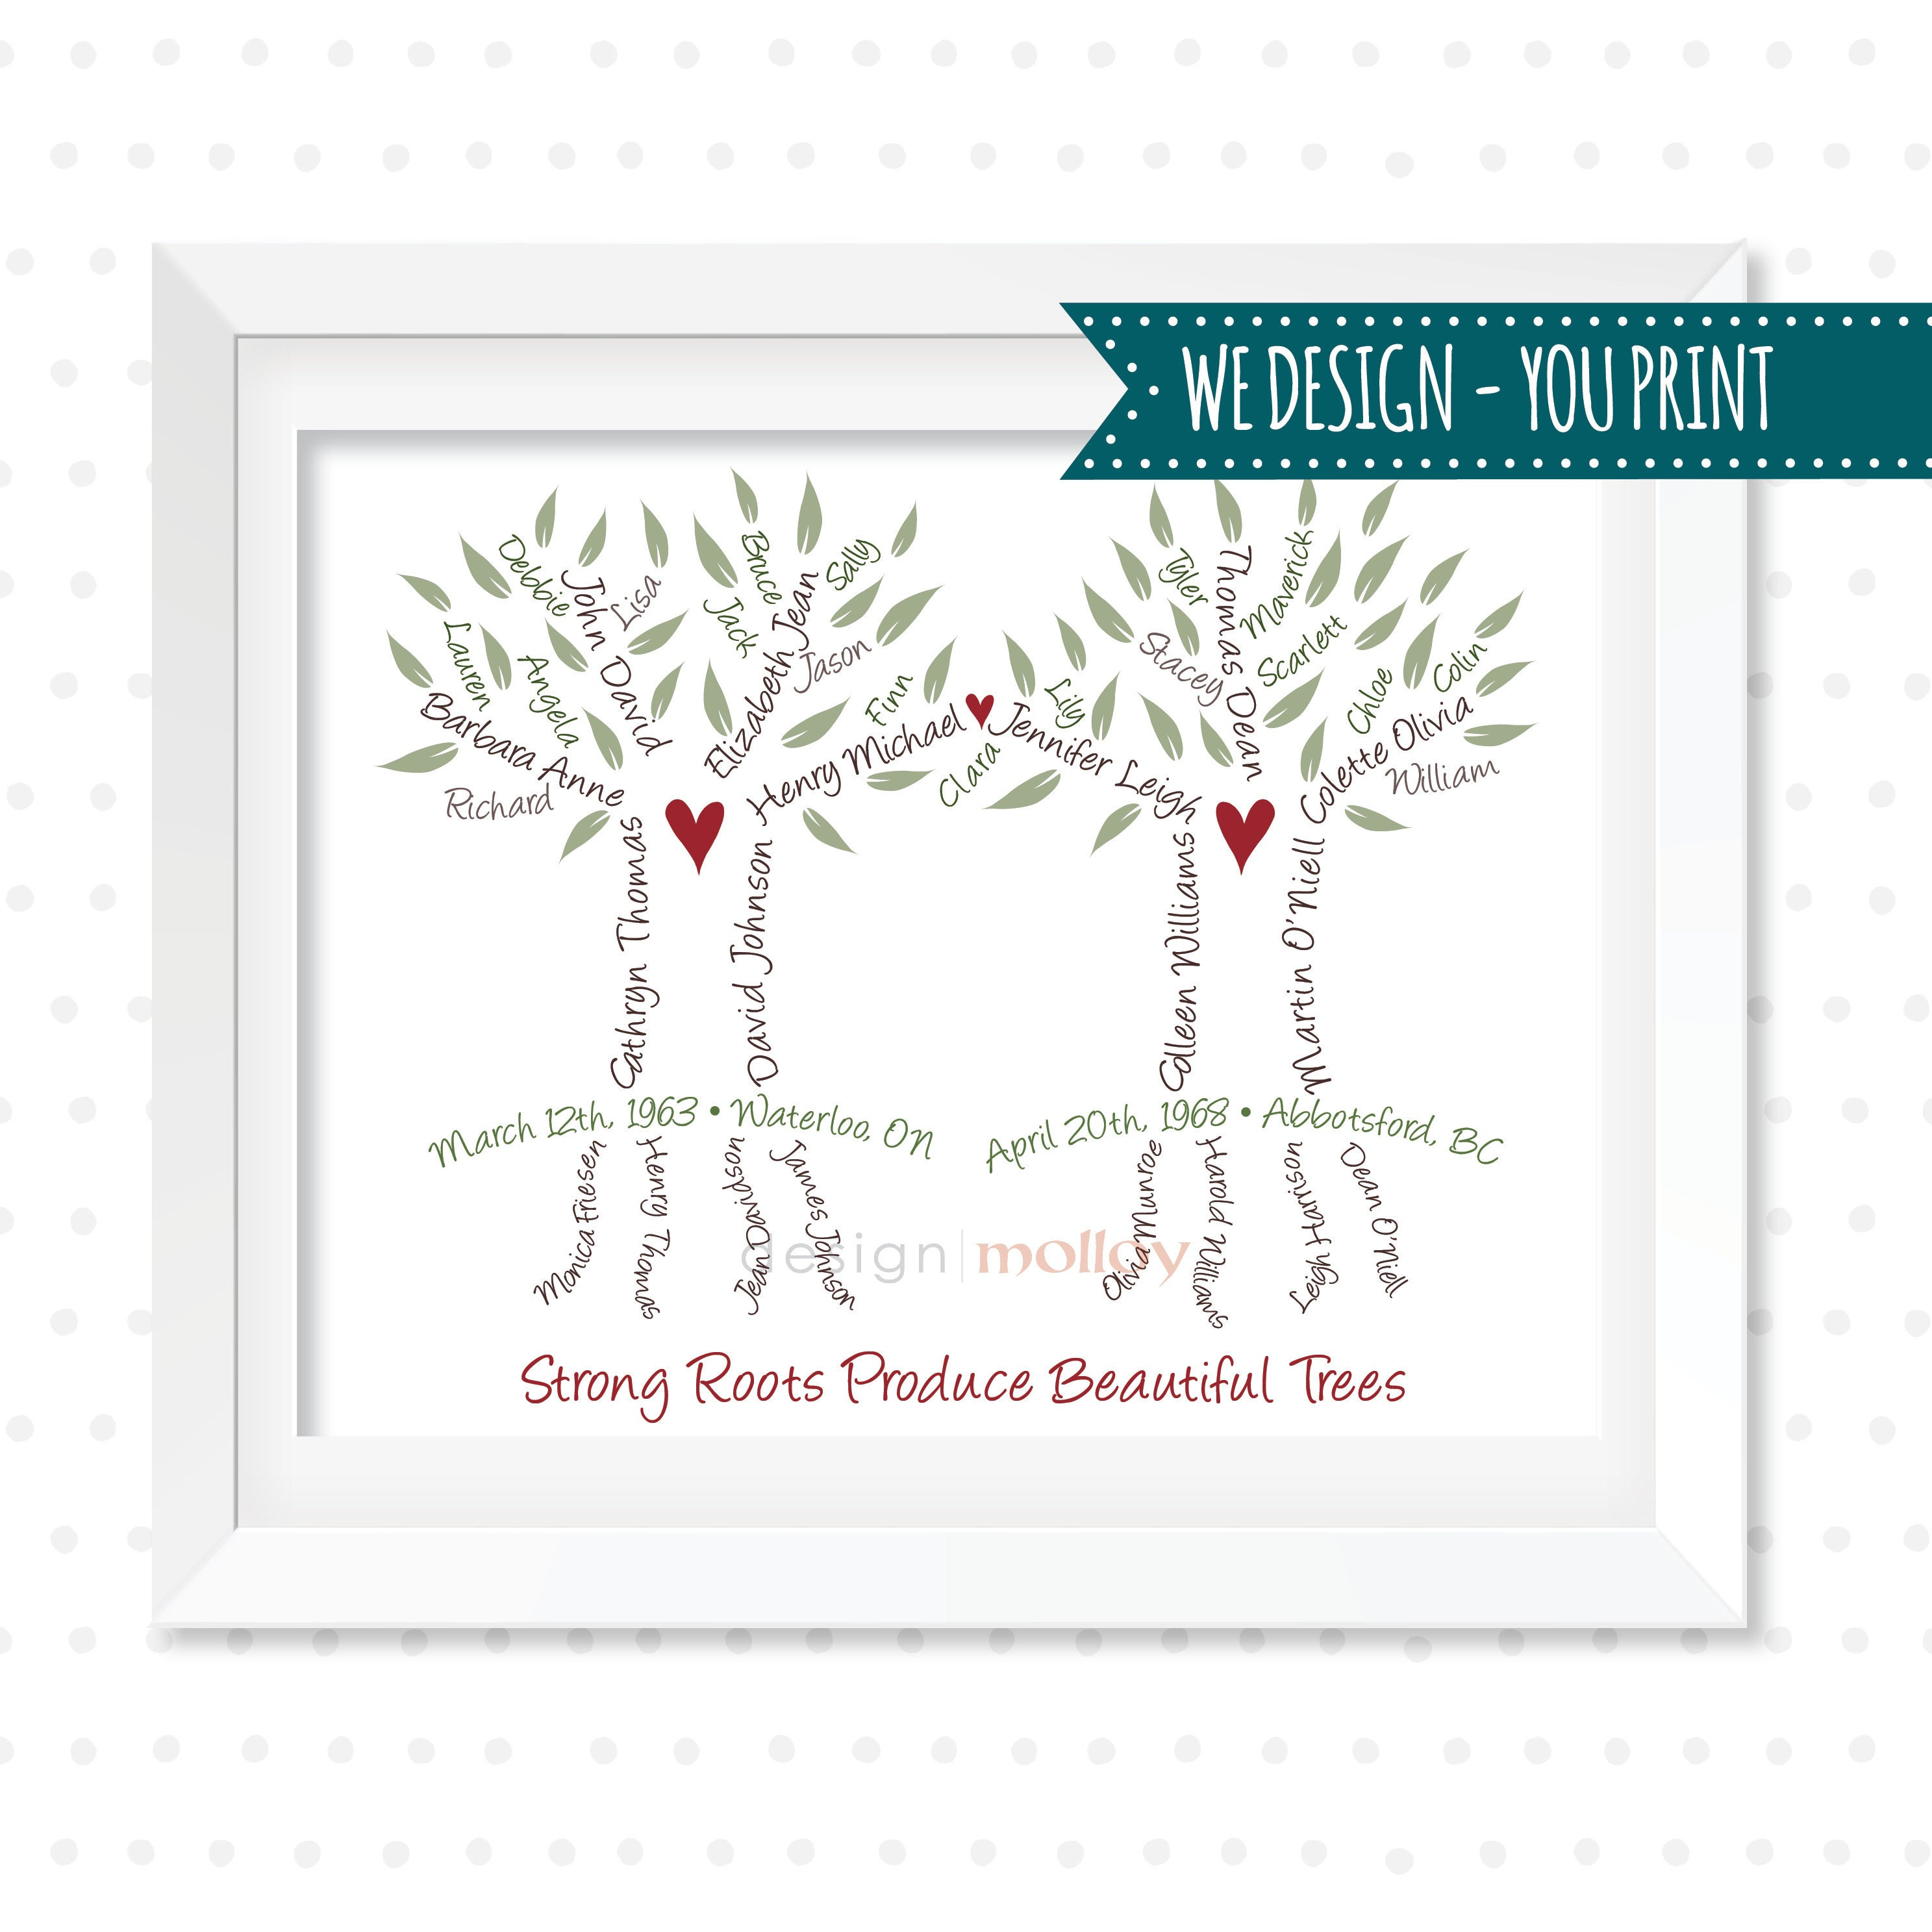 Pizza Blended Family Wedding Artwork DIGITAL FILE Personalized 3 Generation Family Tree Custom Anniversary Gift